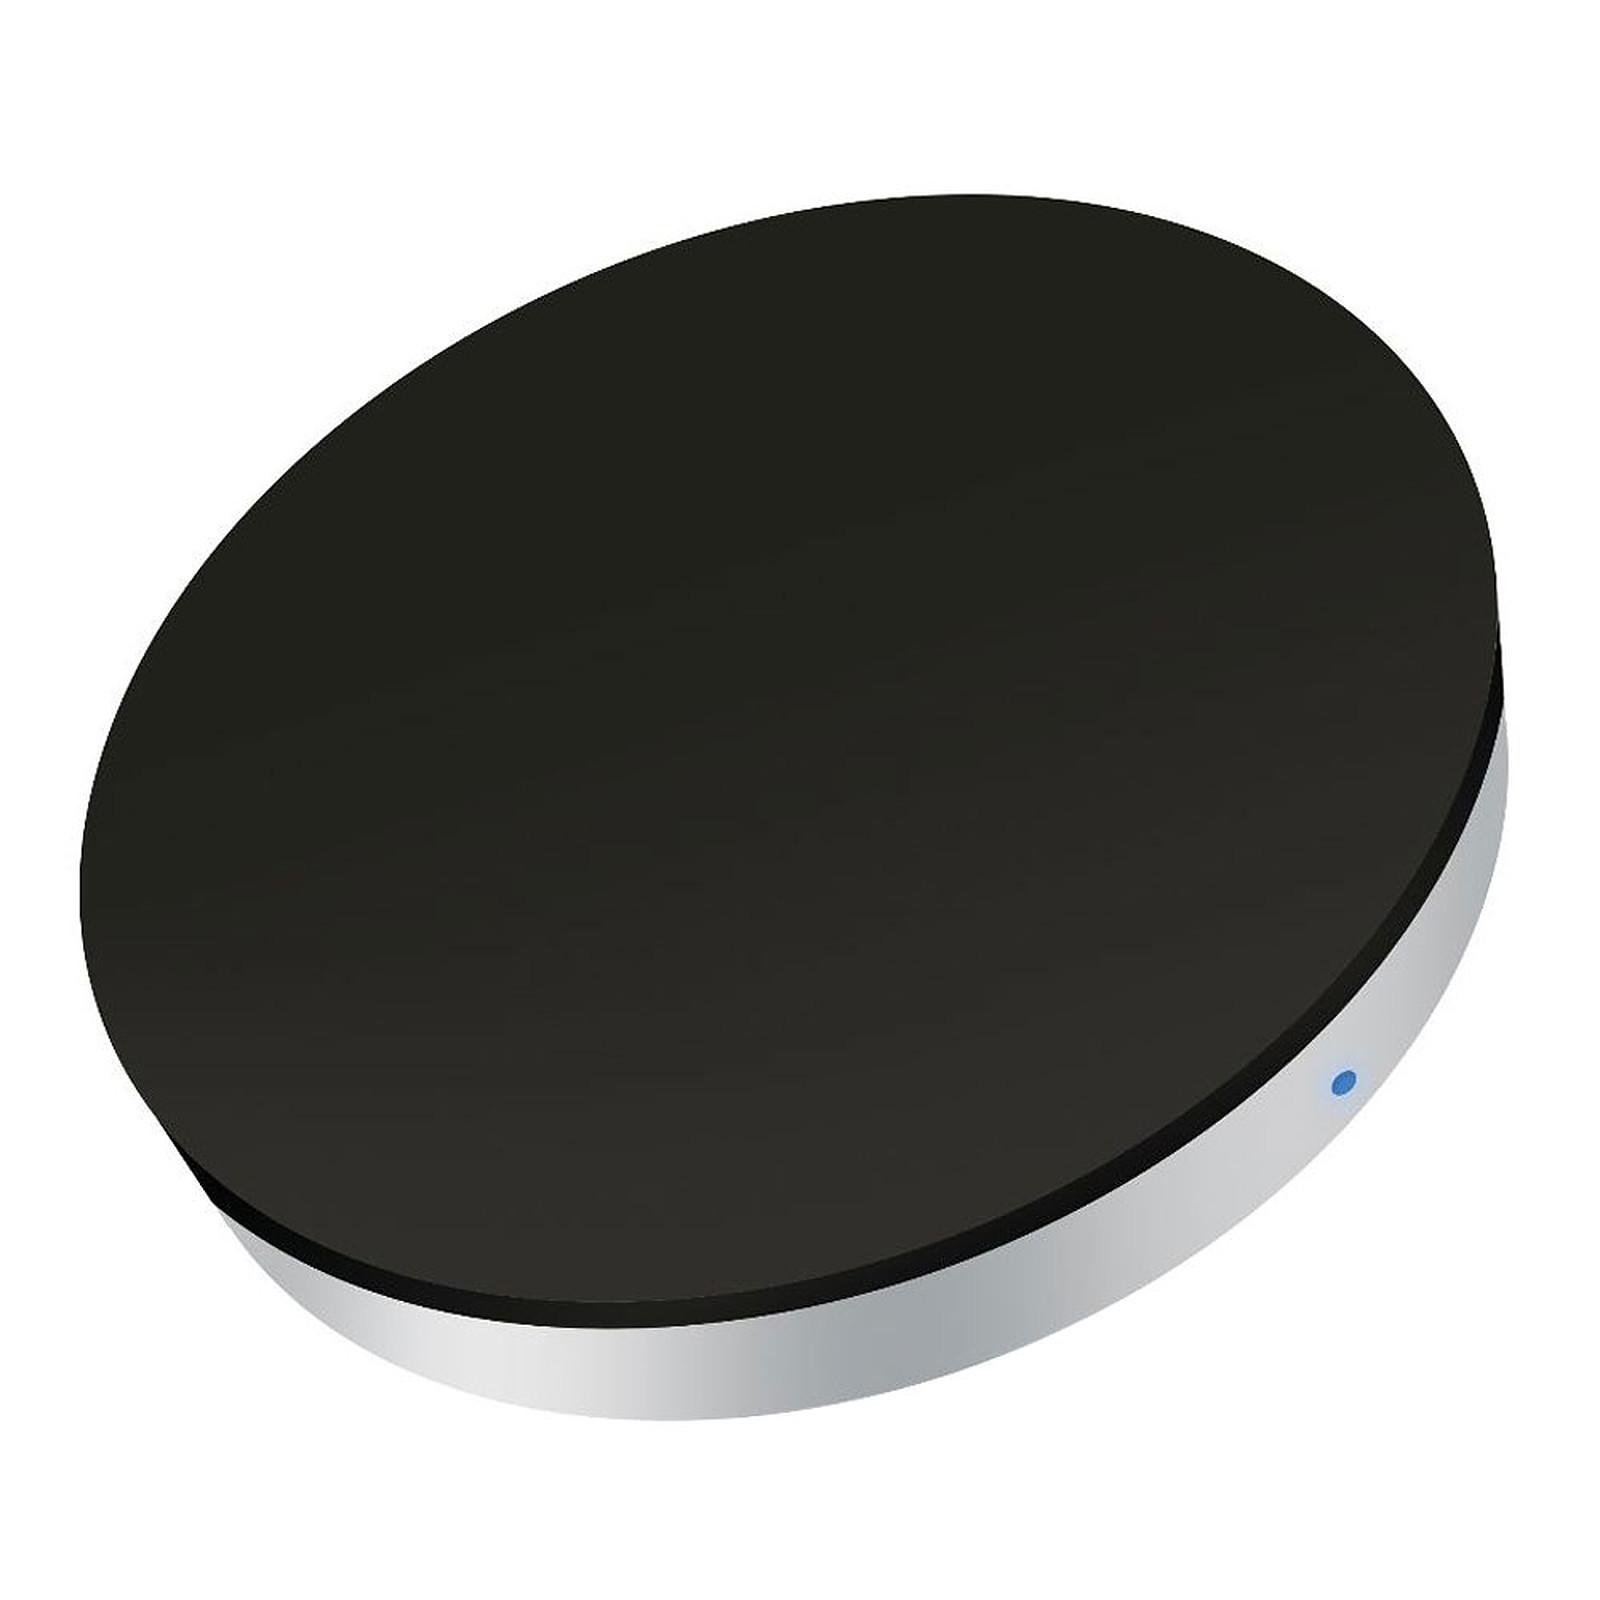 ZENS USB Single Wireless Charger Round